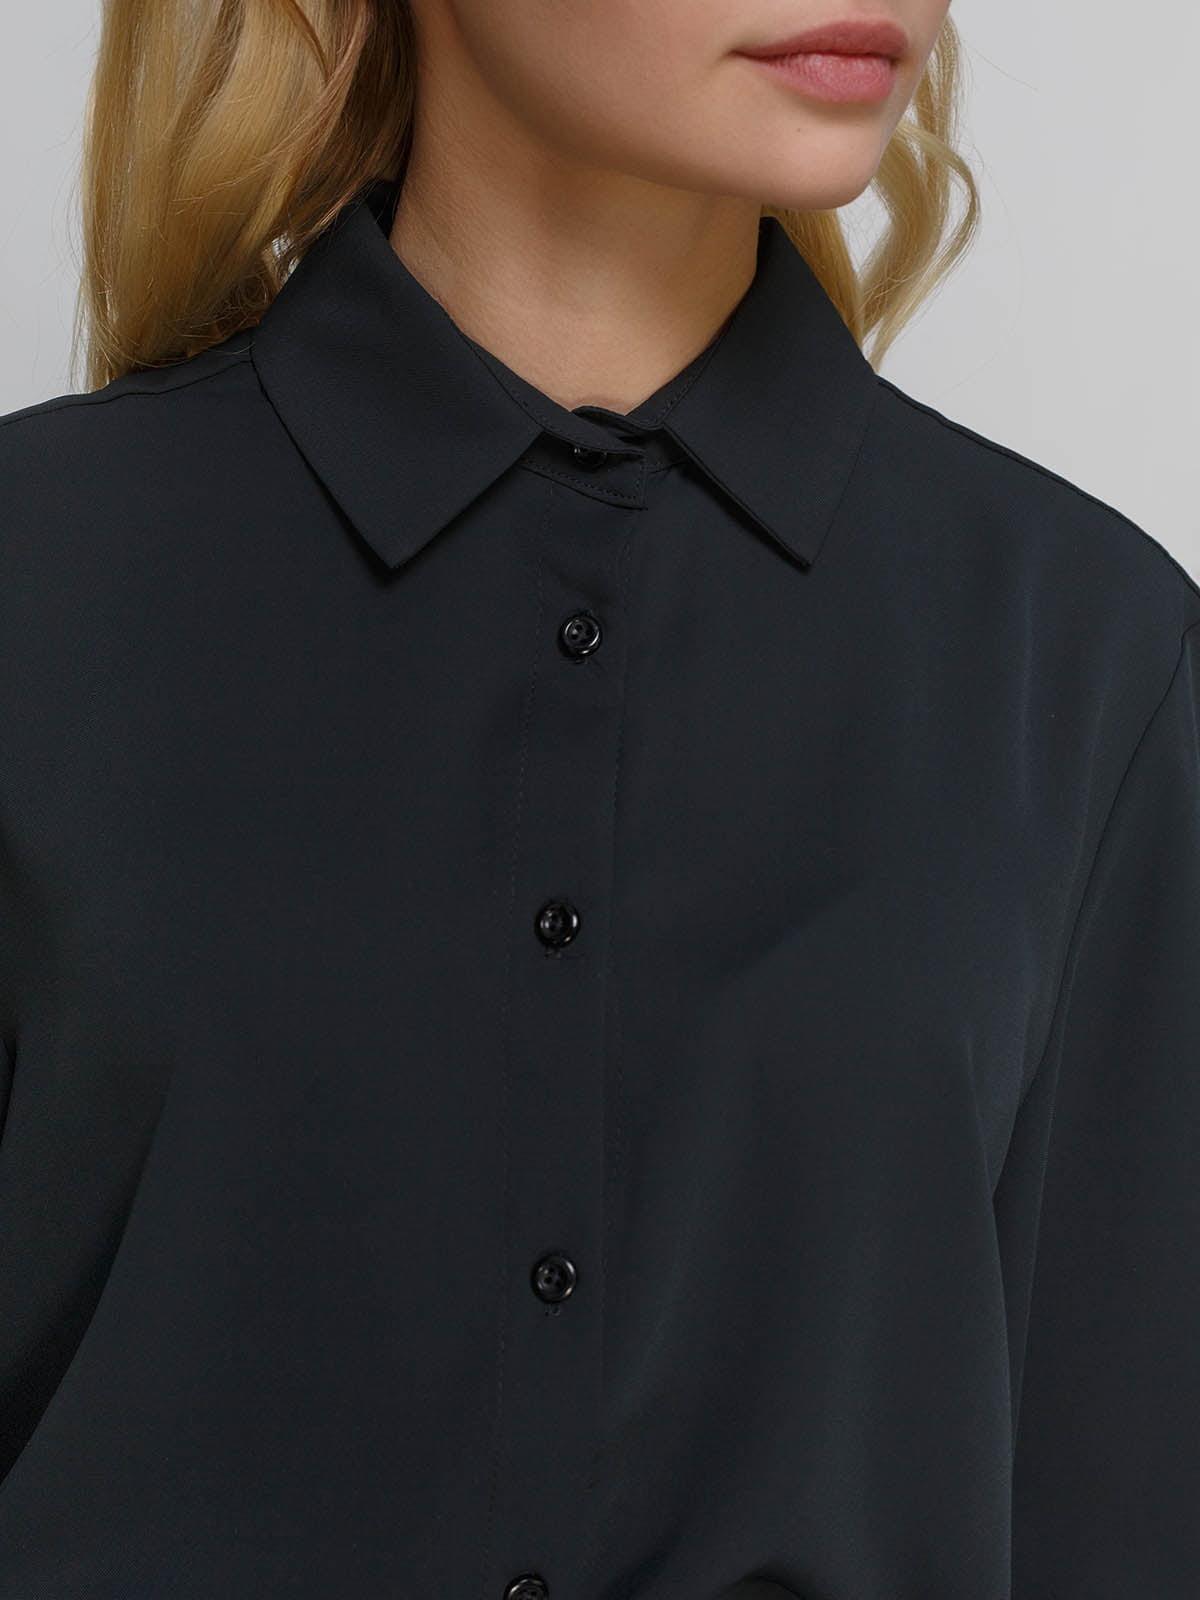 Рубашка черная | 4695390 | фото 3